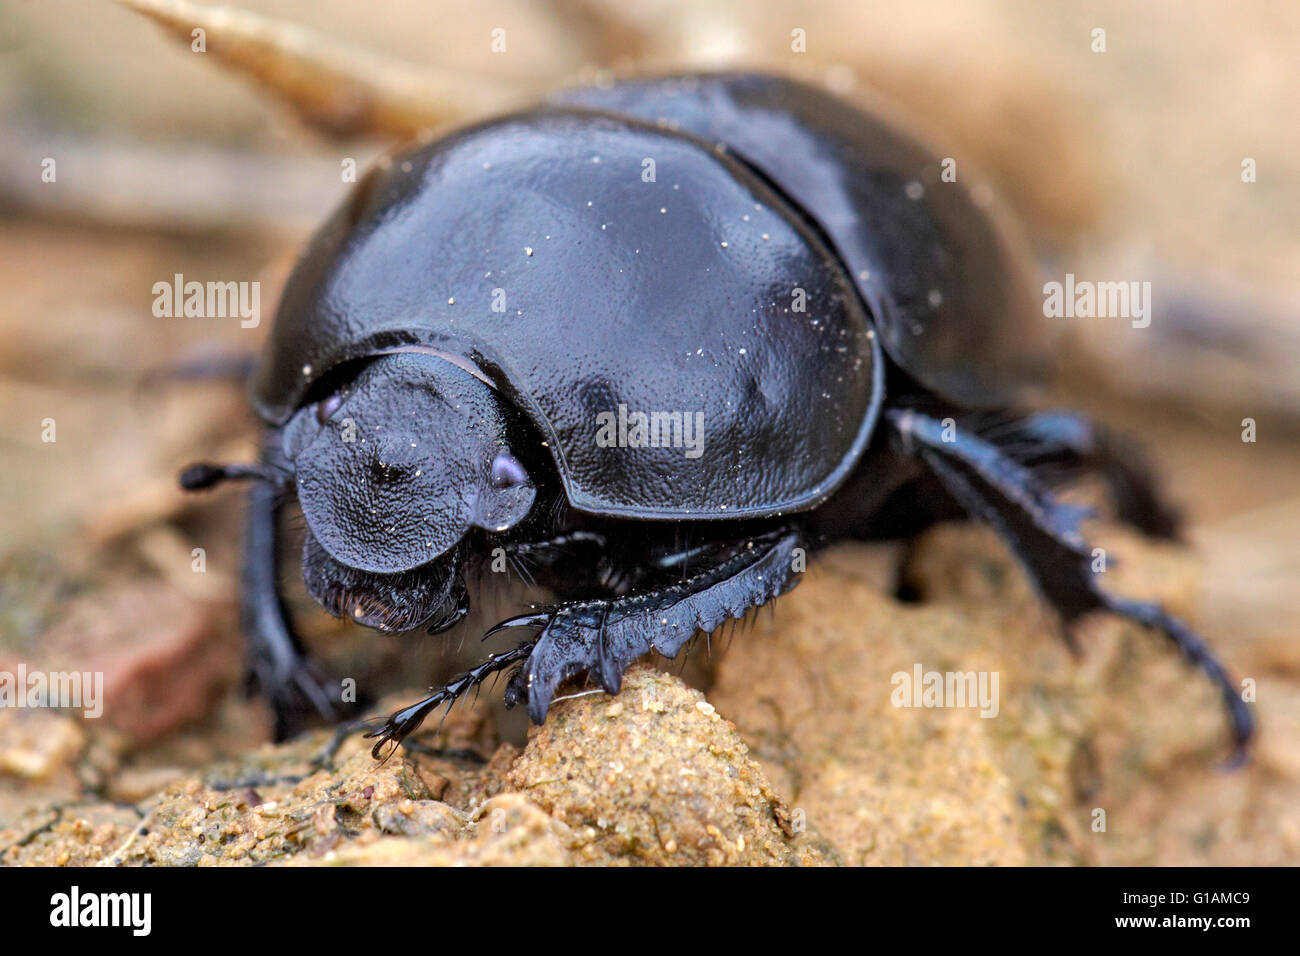 Dung beetle, Thorectes hispanus. - Stock Image